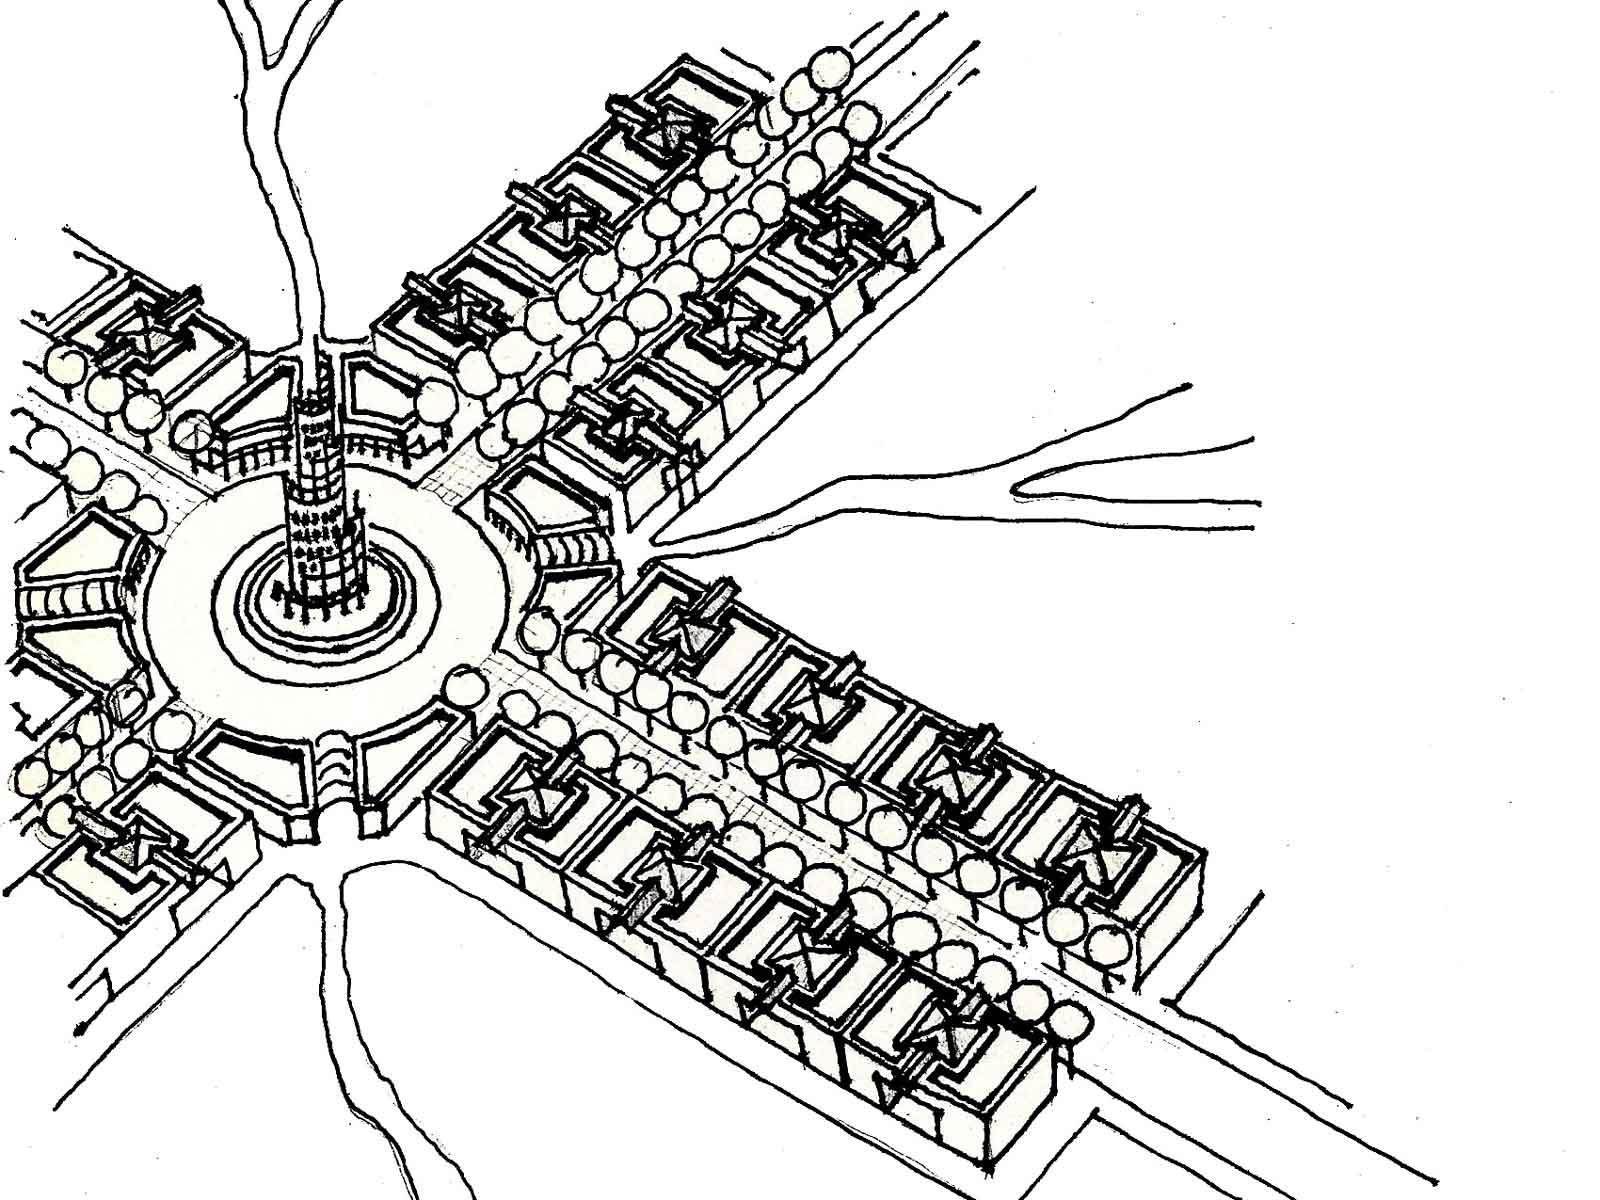 telematica-2025-eco-city-1-vista-barcelona-spain-1986